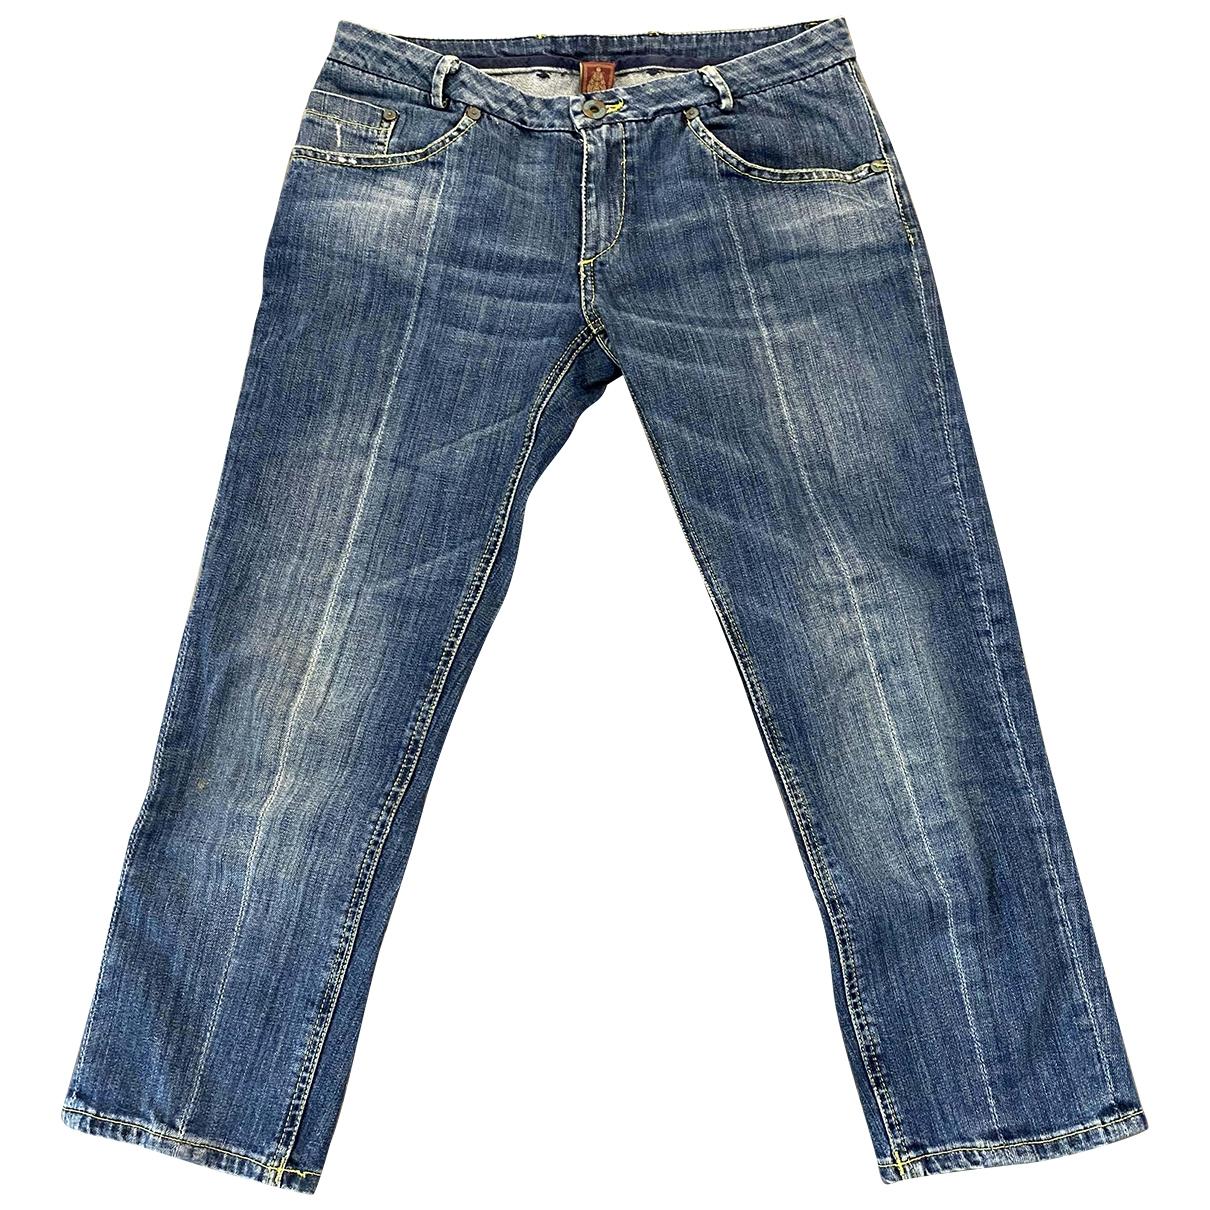 Dondup \N Blue Denim - Jeans Jeans for Women 26 US